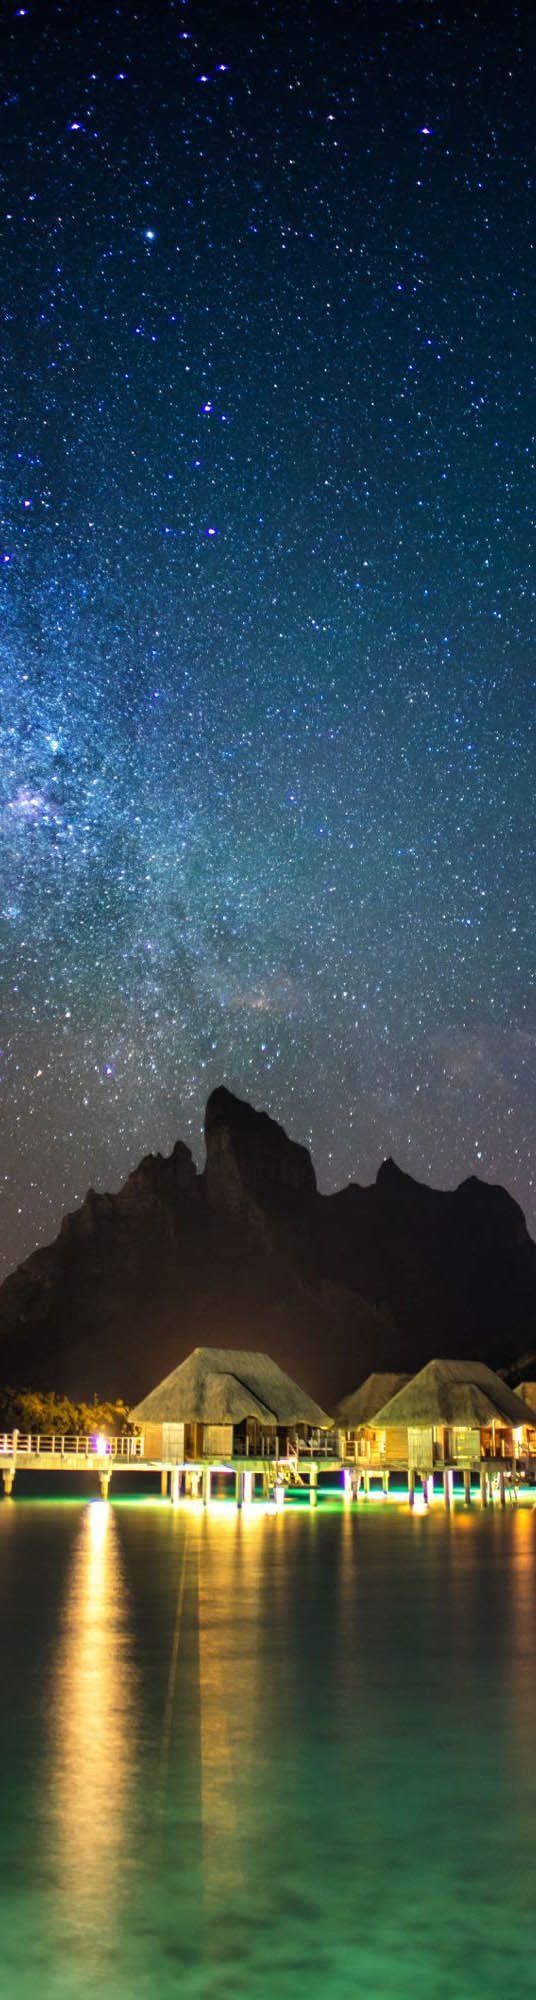 Milky Way over Bora Bora - photo from #treyratcliff Trey Ratcliff at http://www.StuckInCustoms.com